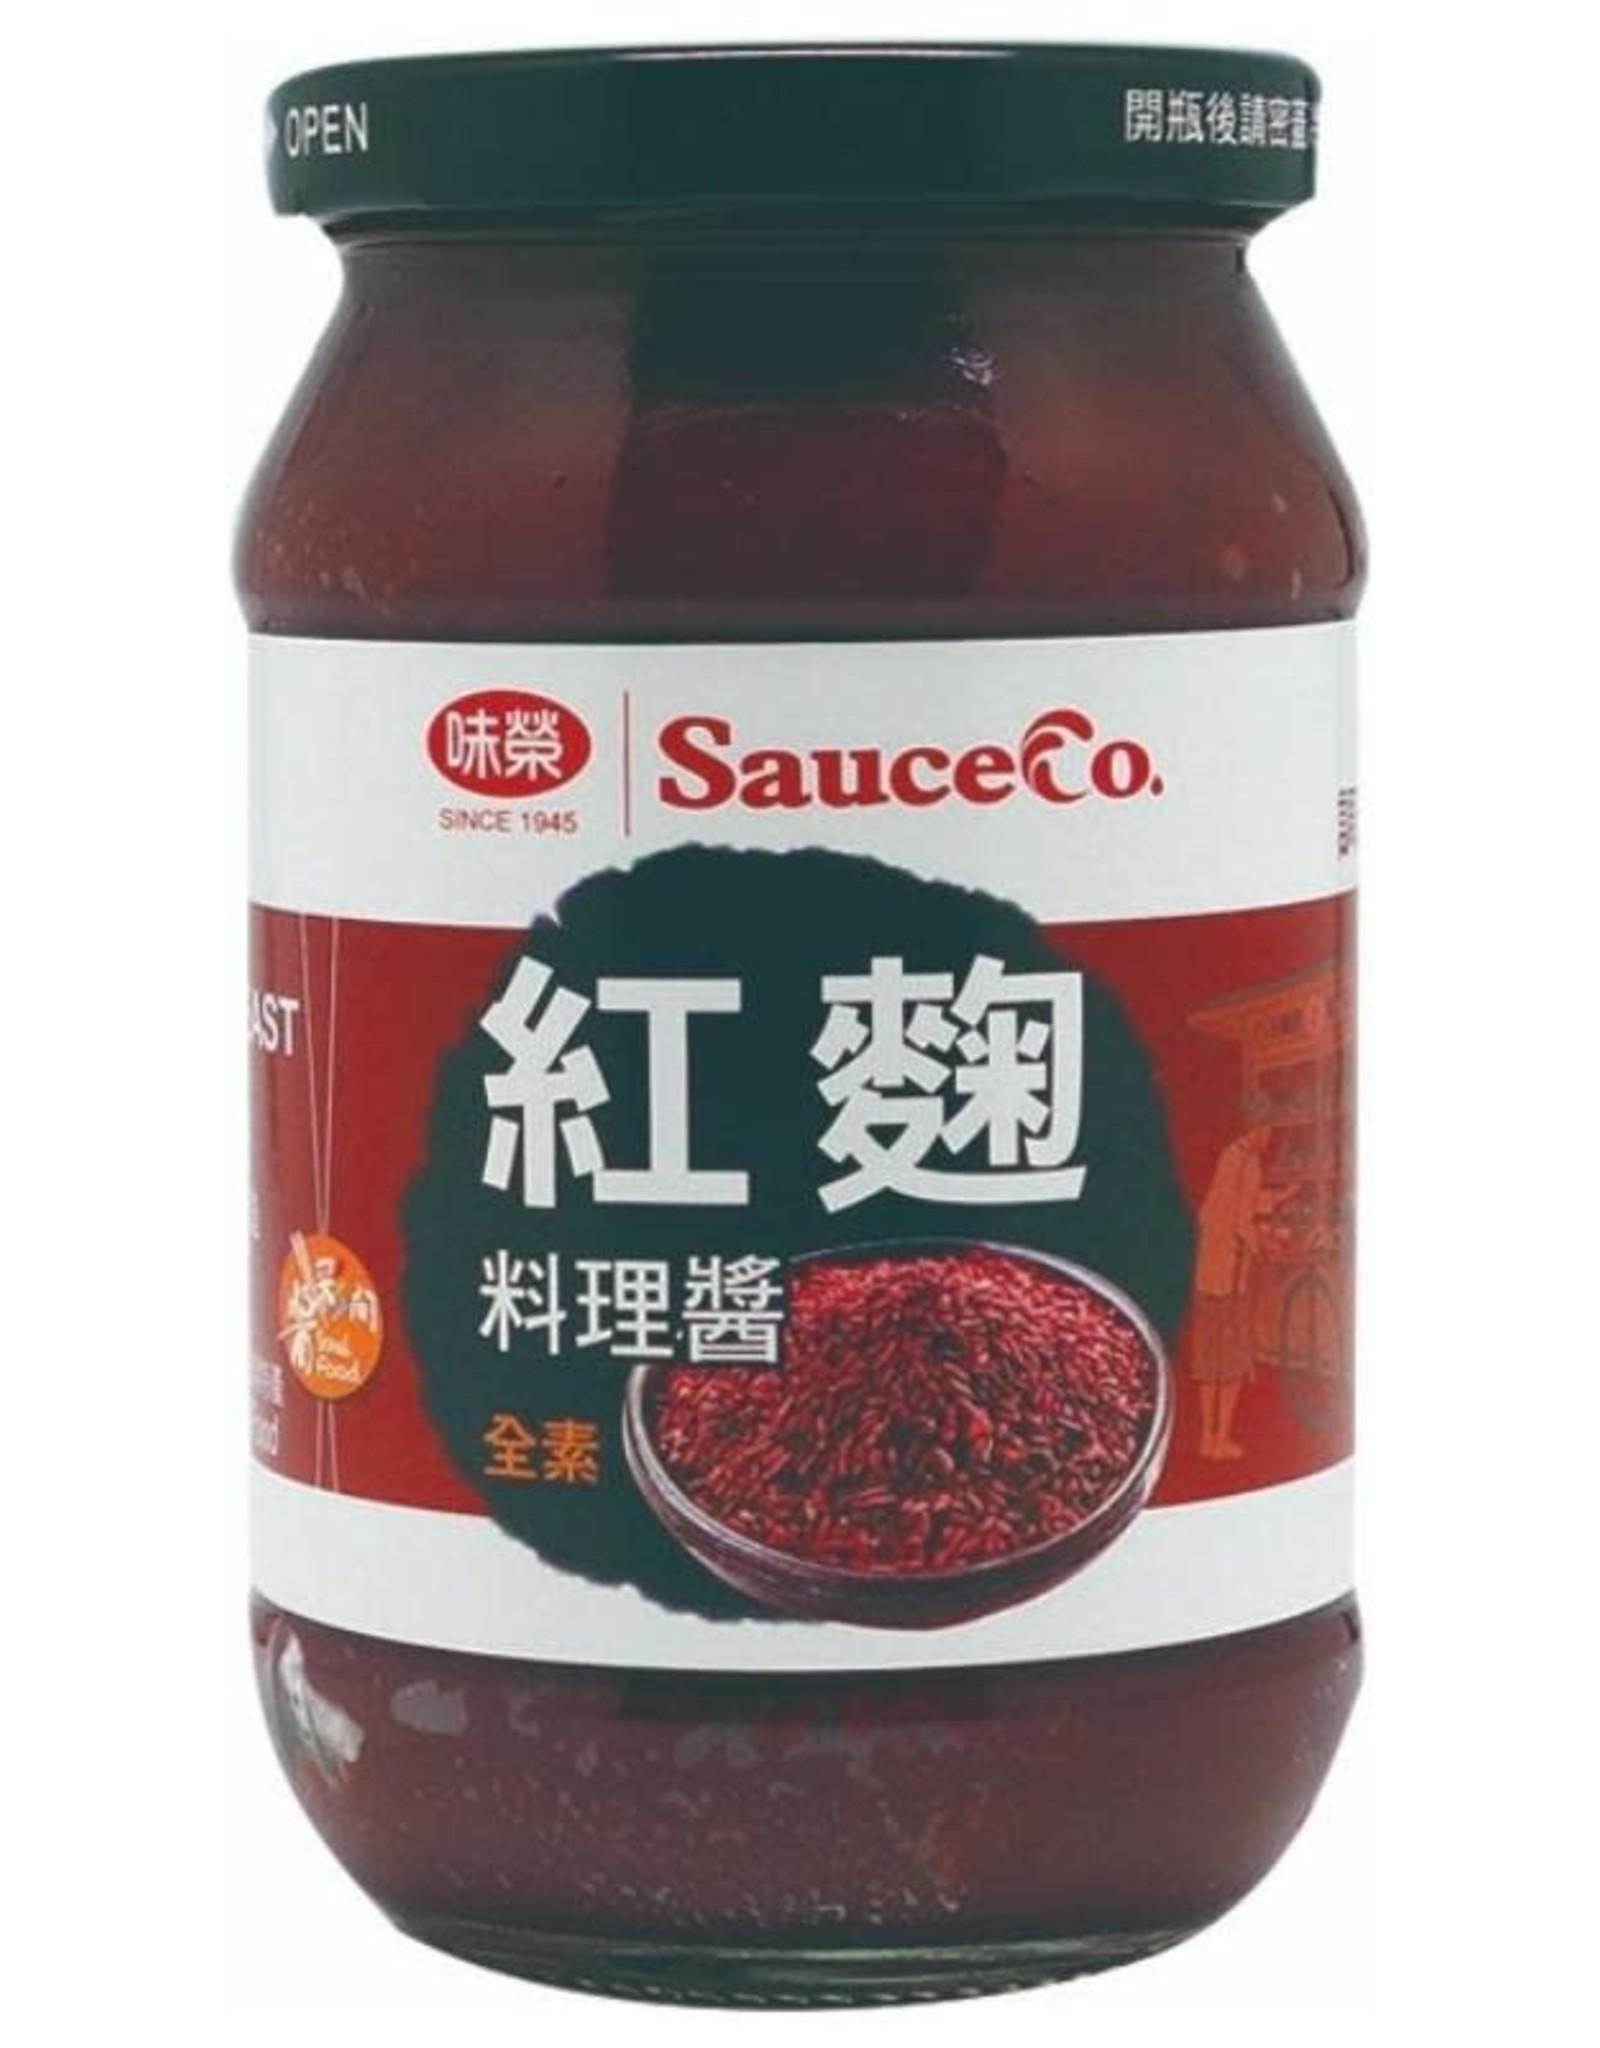 (UK) Vege SauceCo Yeast Rice Sauce*(味榮) 紅麴料理醬